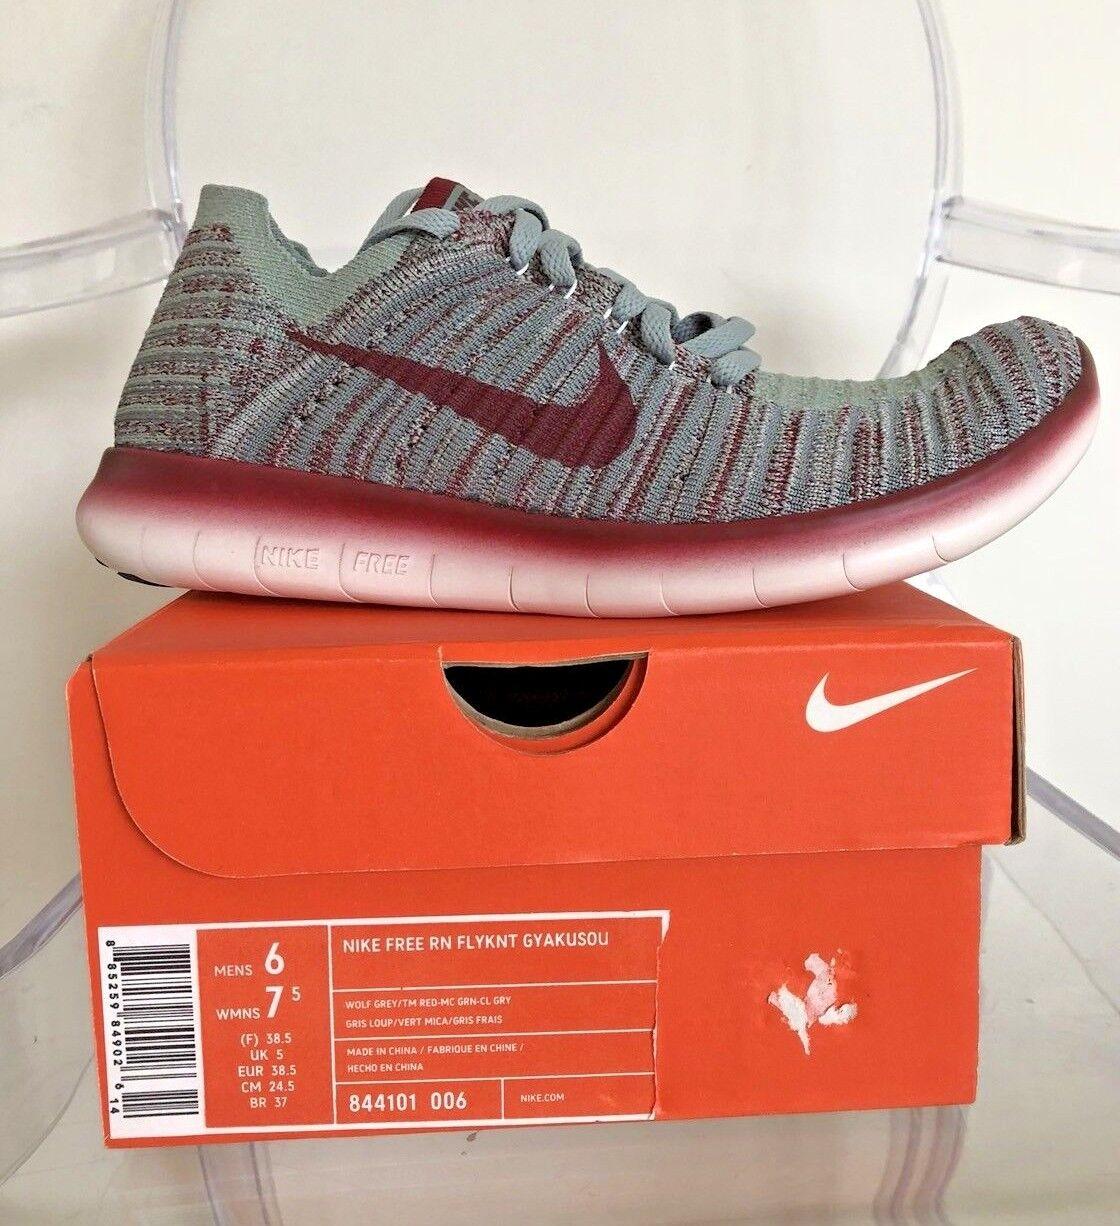 Nike Free RN Flyknit Gyakusou 844101 006 Wolf Grey TM Red M 6  W 7.5